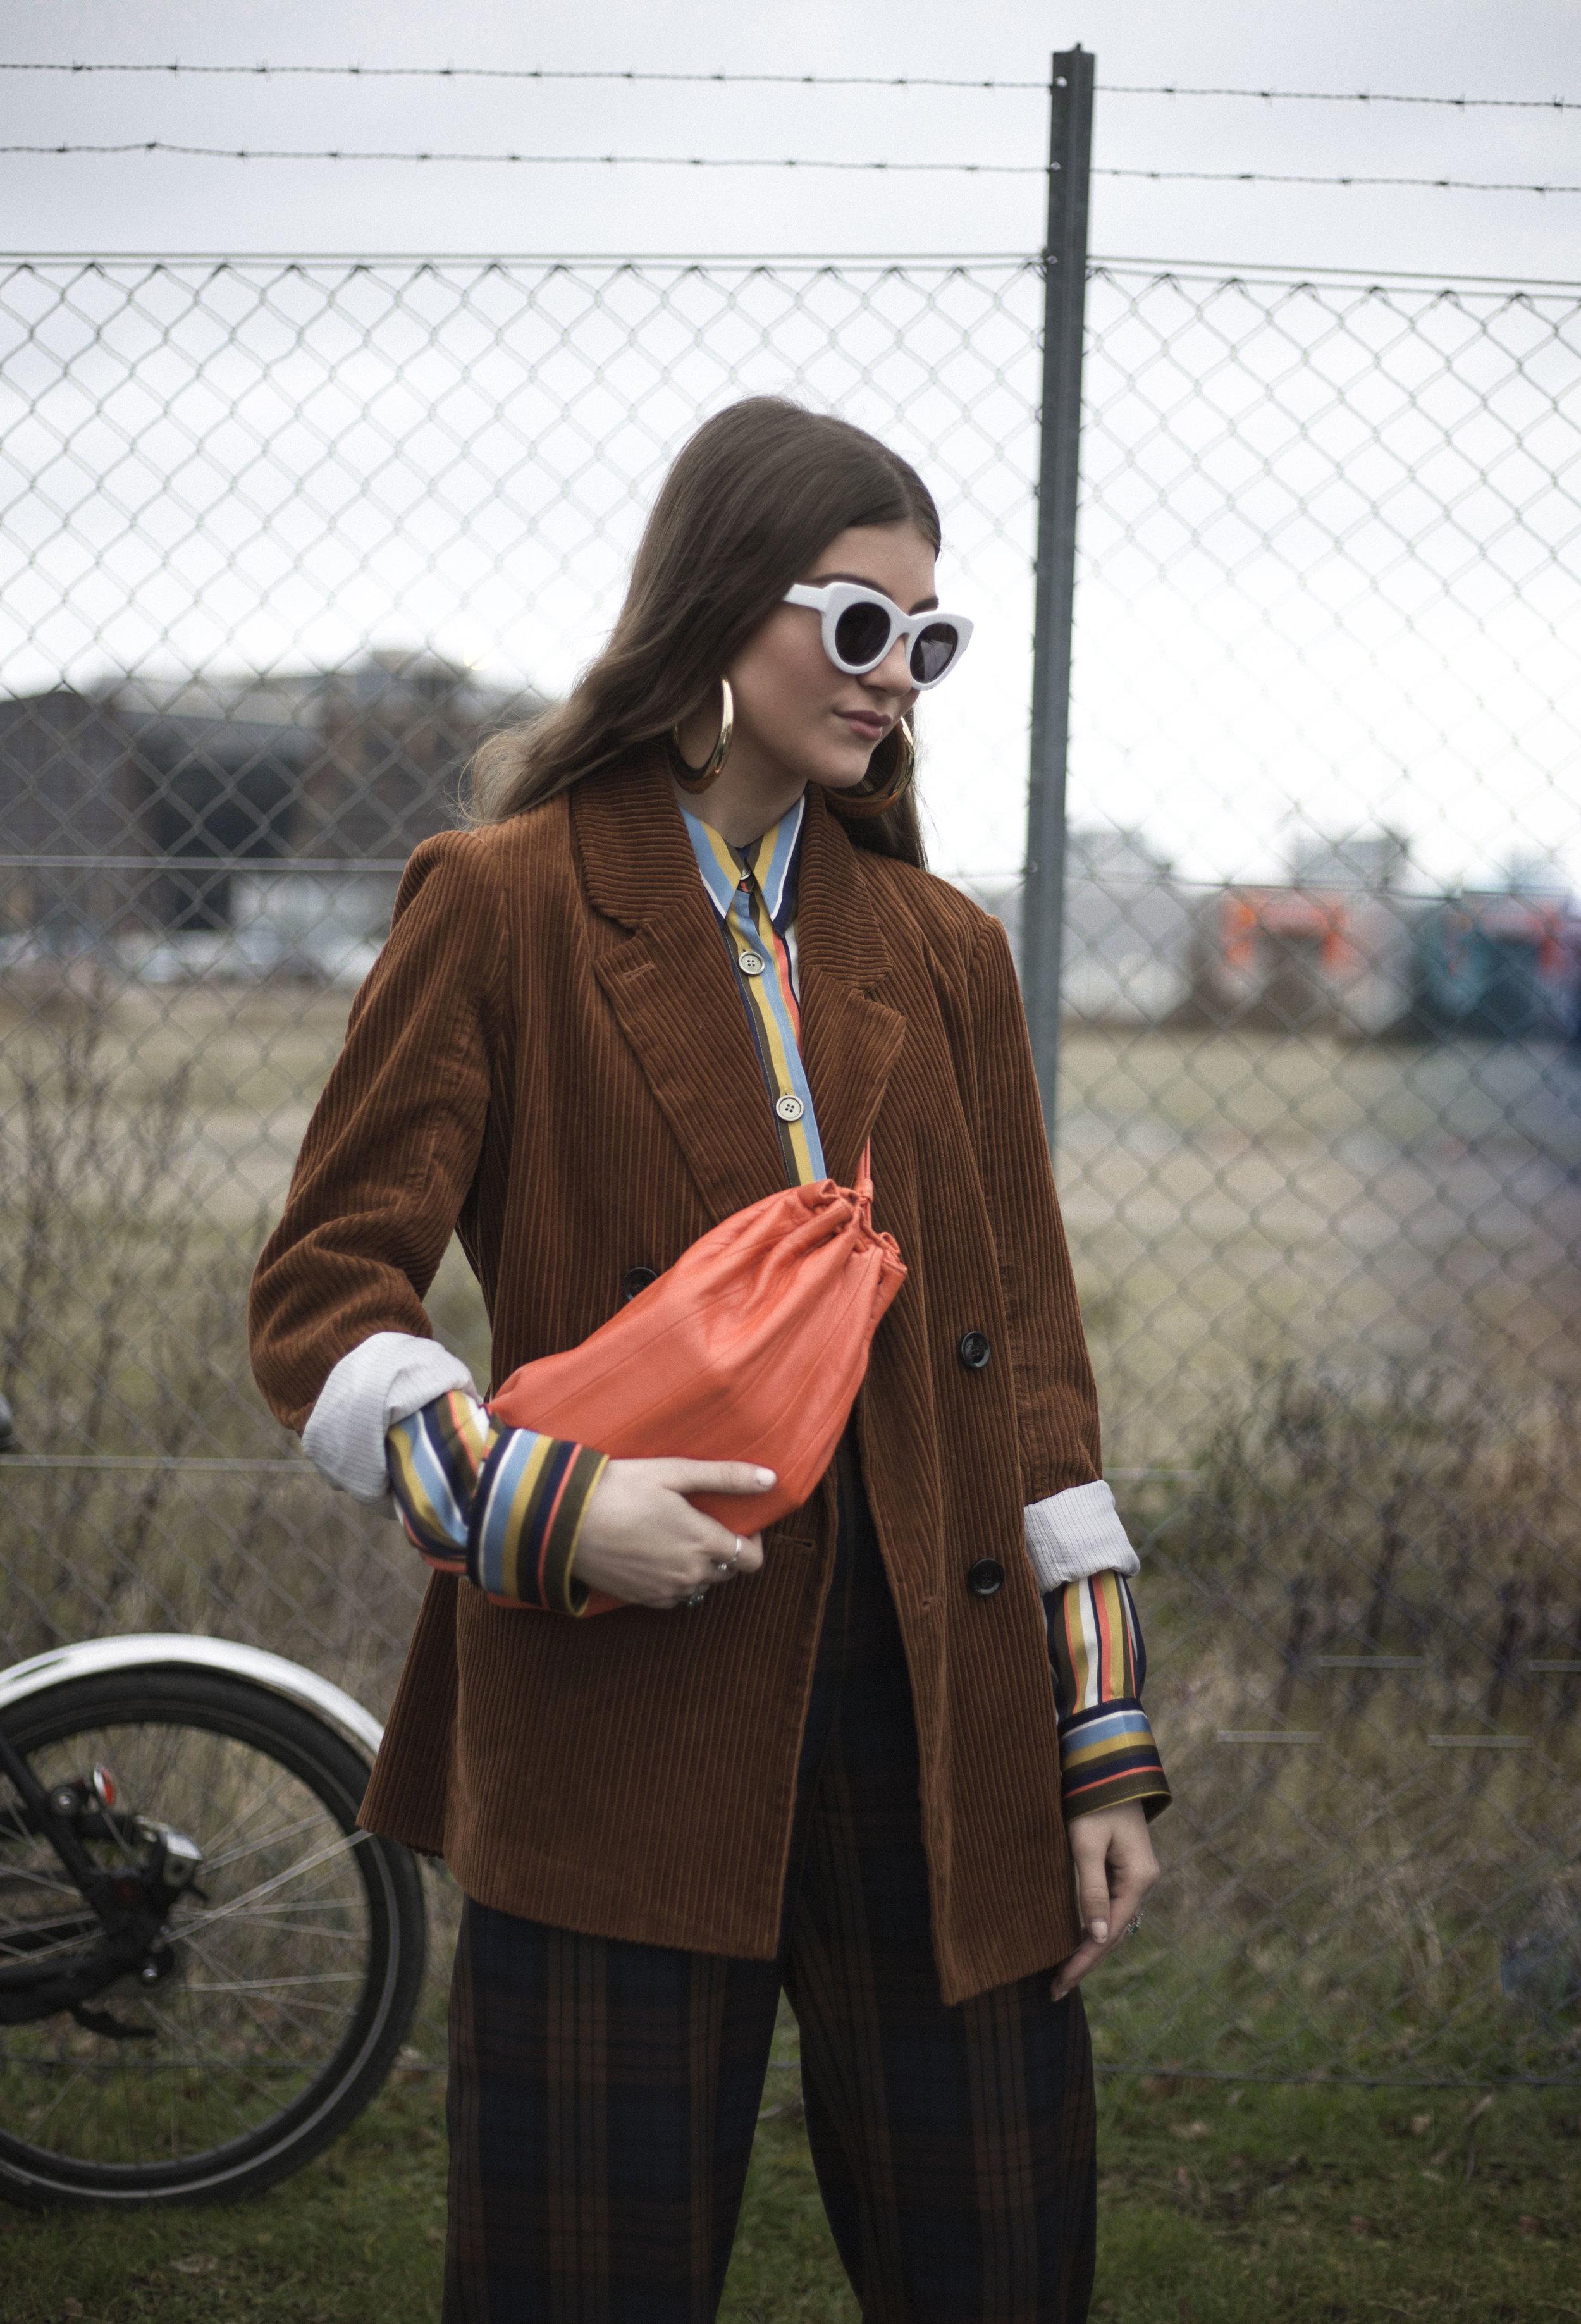 maren-schia-copenhagen-fashion-week-aw18-scandinavian-street-style-streetstyle-thestreetland-fashion-best-style.jpg